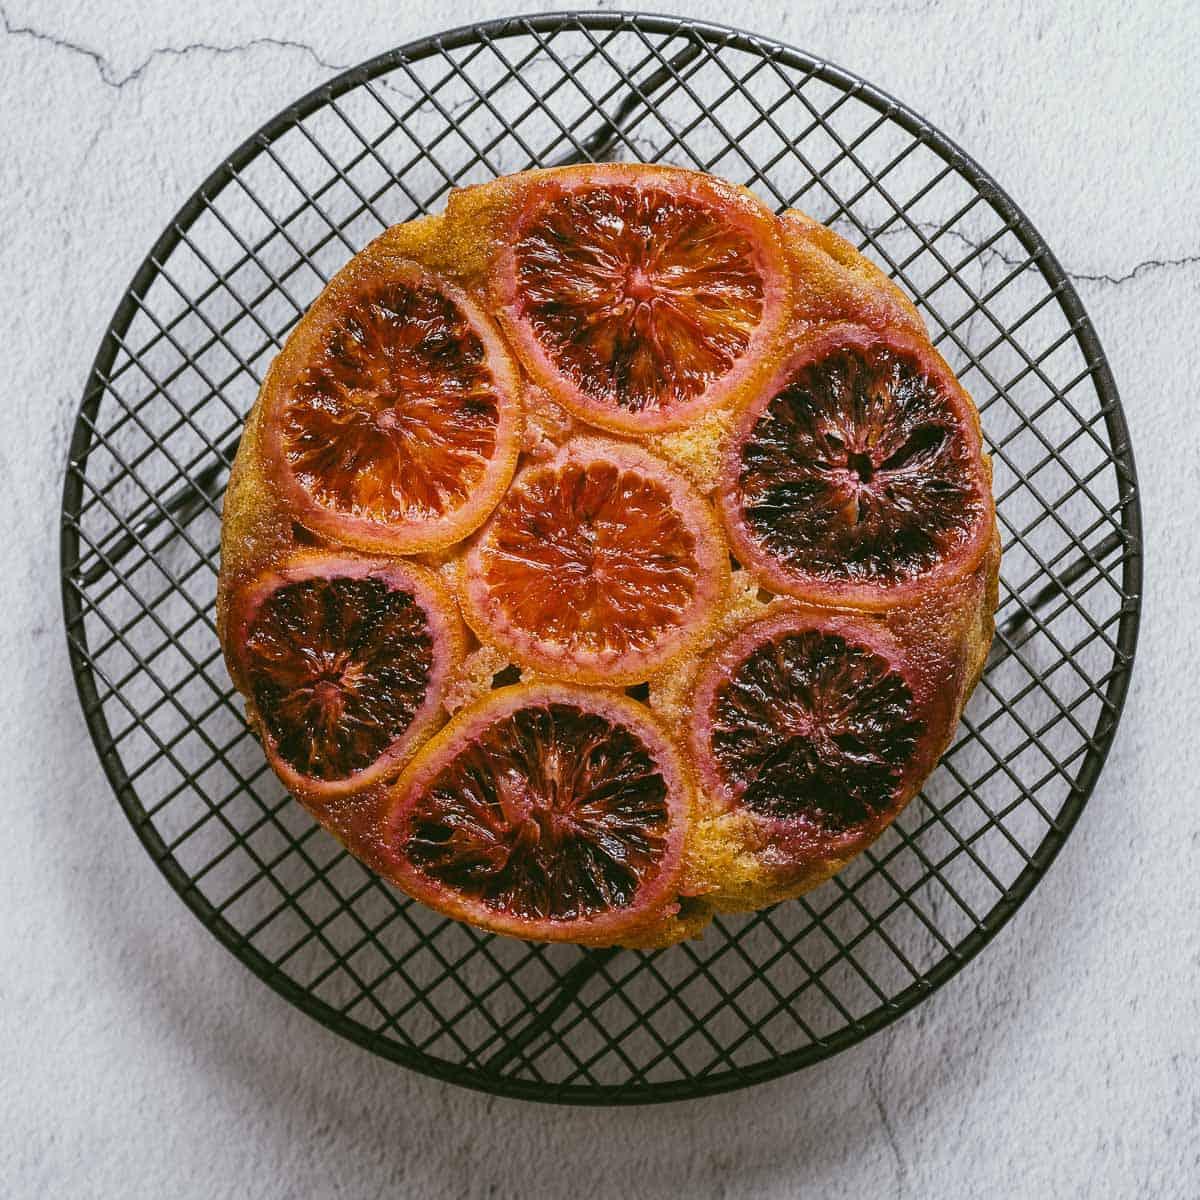 a blood orange cake on a cooling rack.